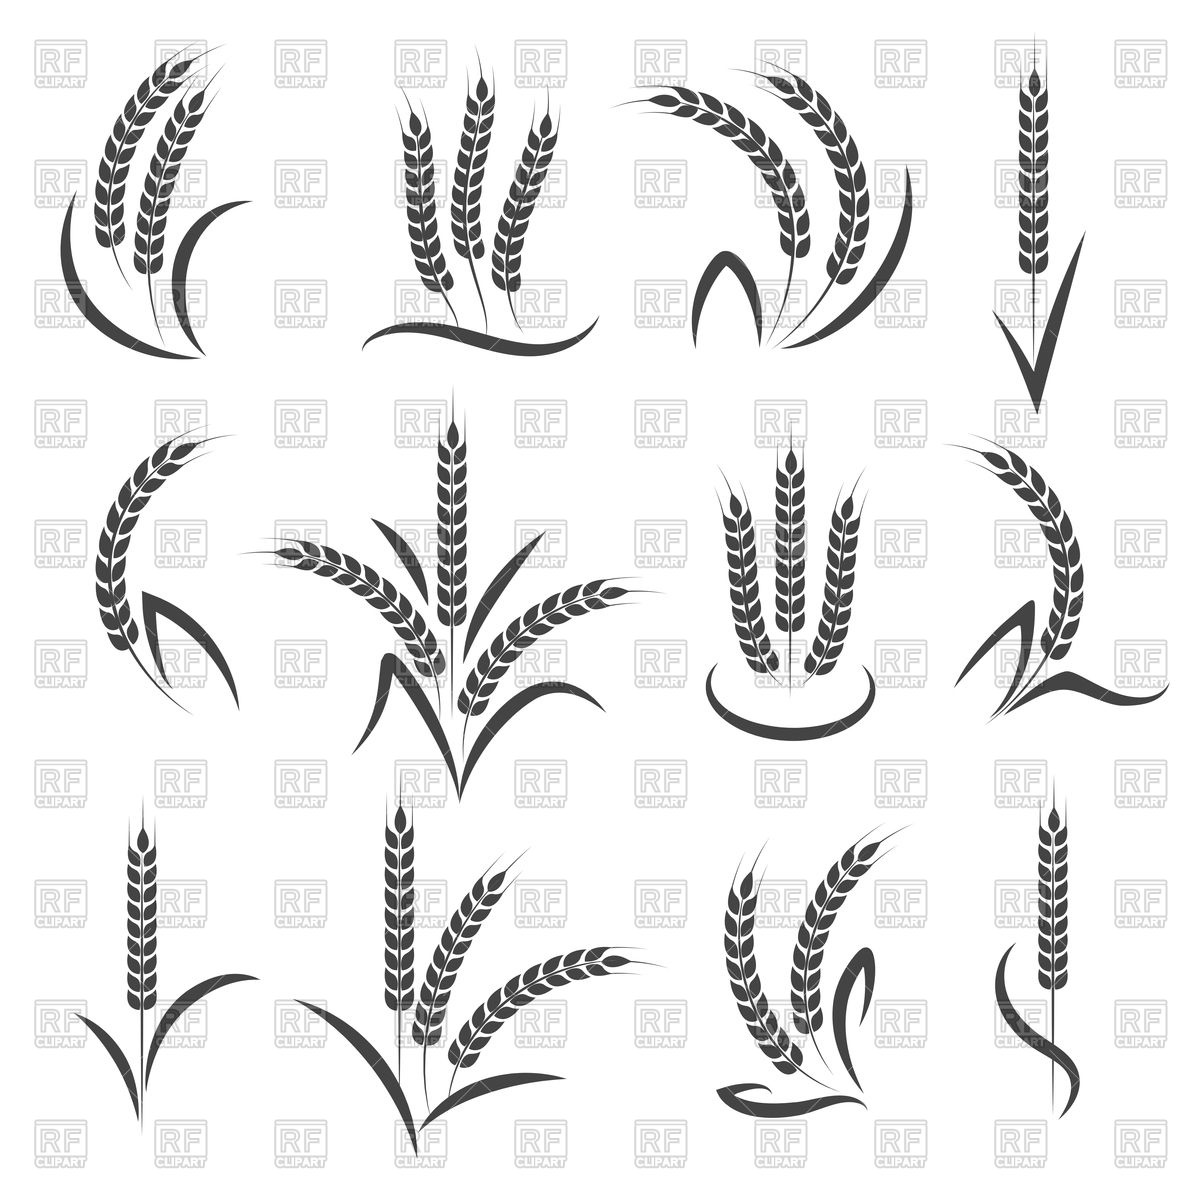 1200x1200 Wheat Or Barley Ears Branch Vector Image Vector Artwork Of